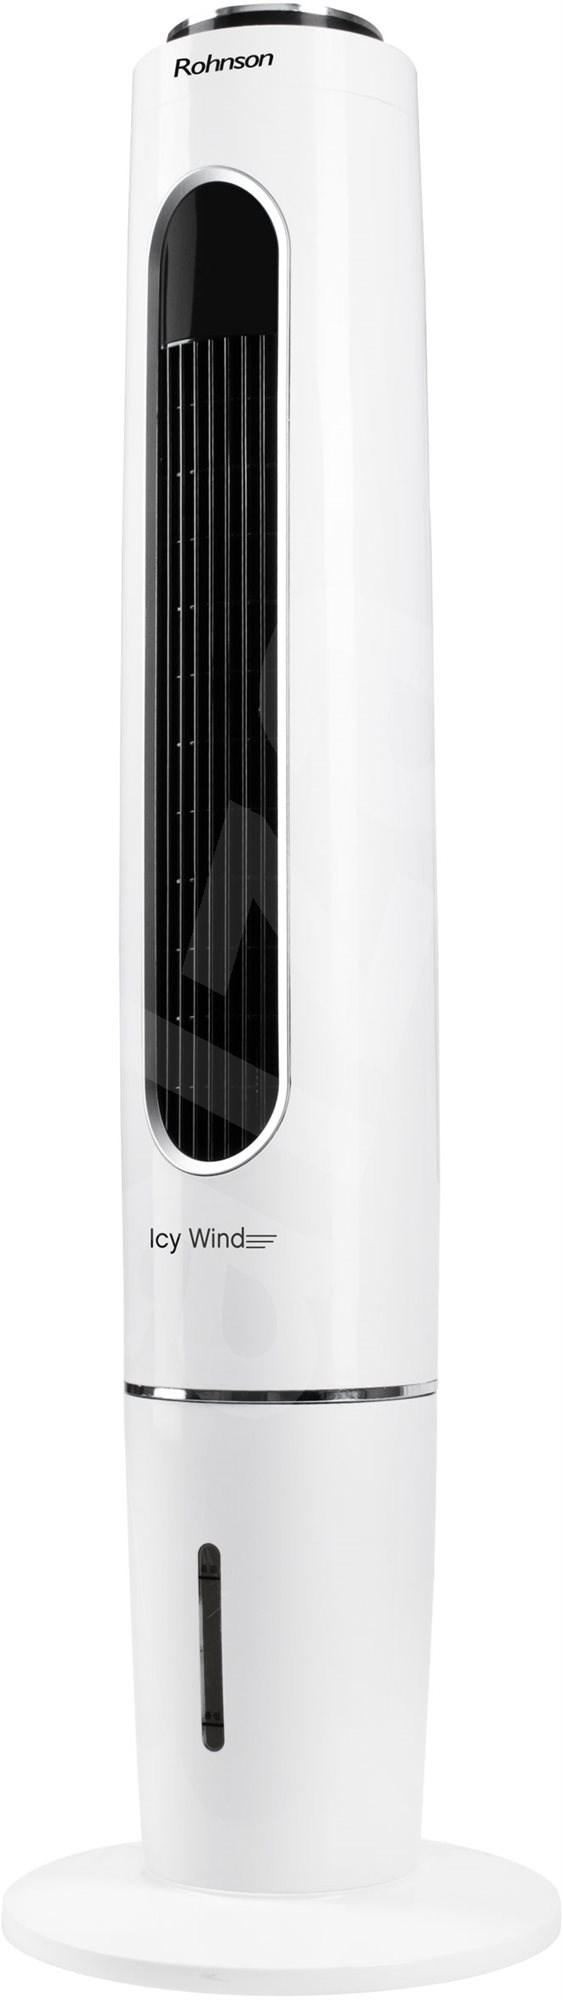 ROHNSON R-873 Icy Wind - Léghűtő.